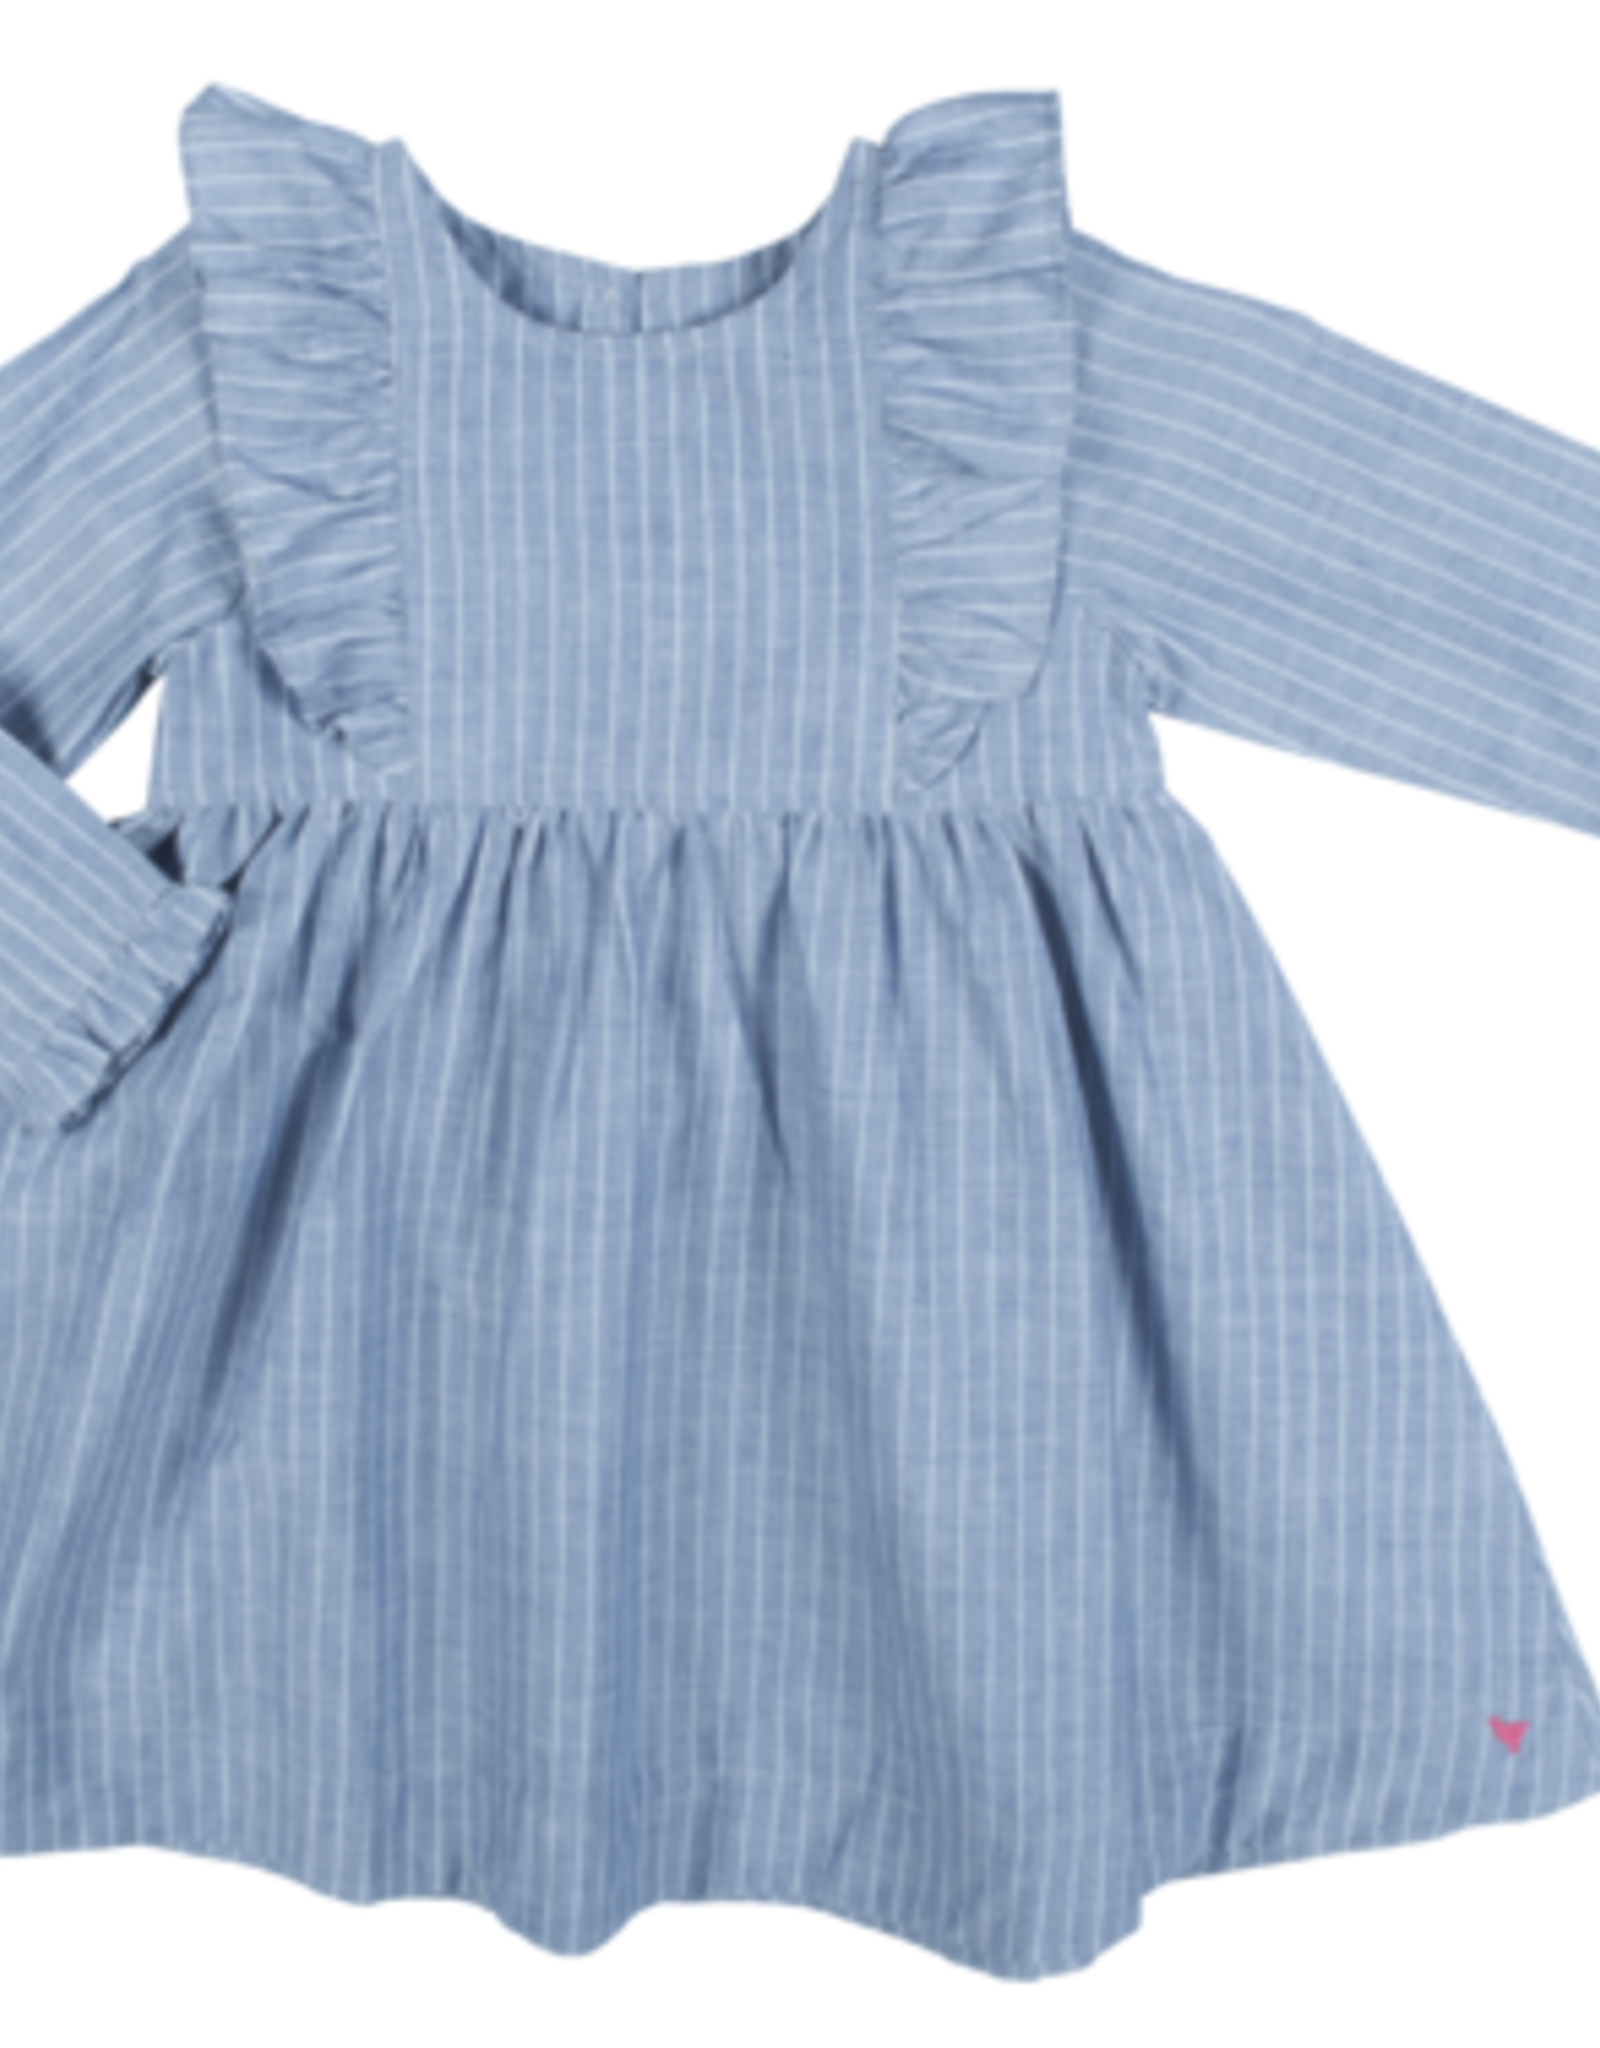 Pink Chicken Kylie dress blue/white pinstripe chambray